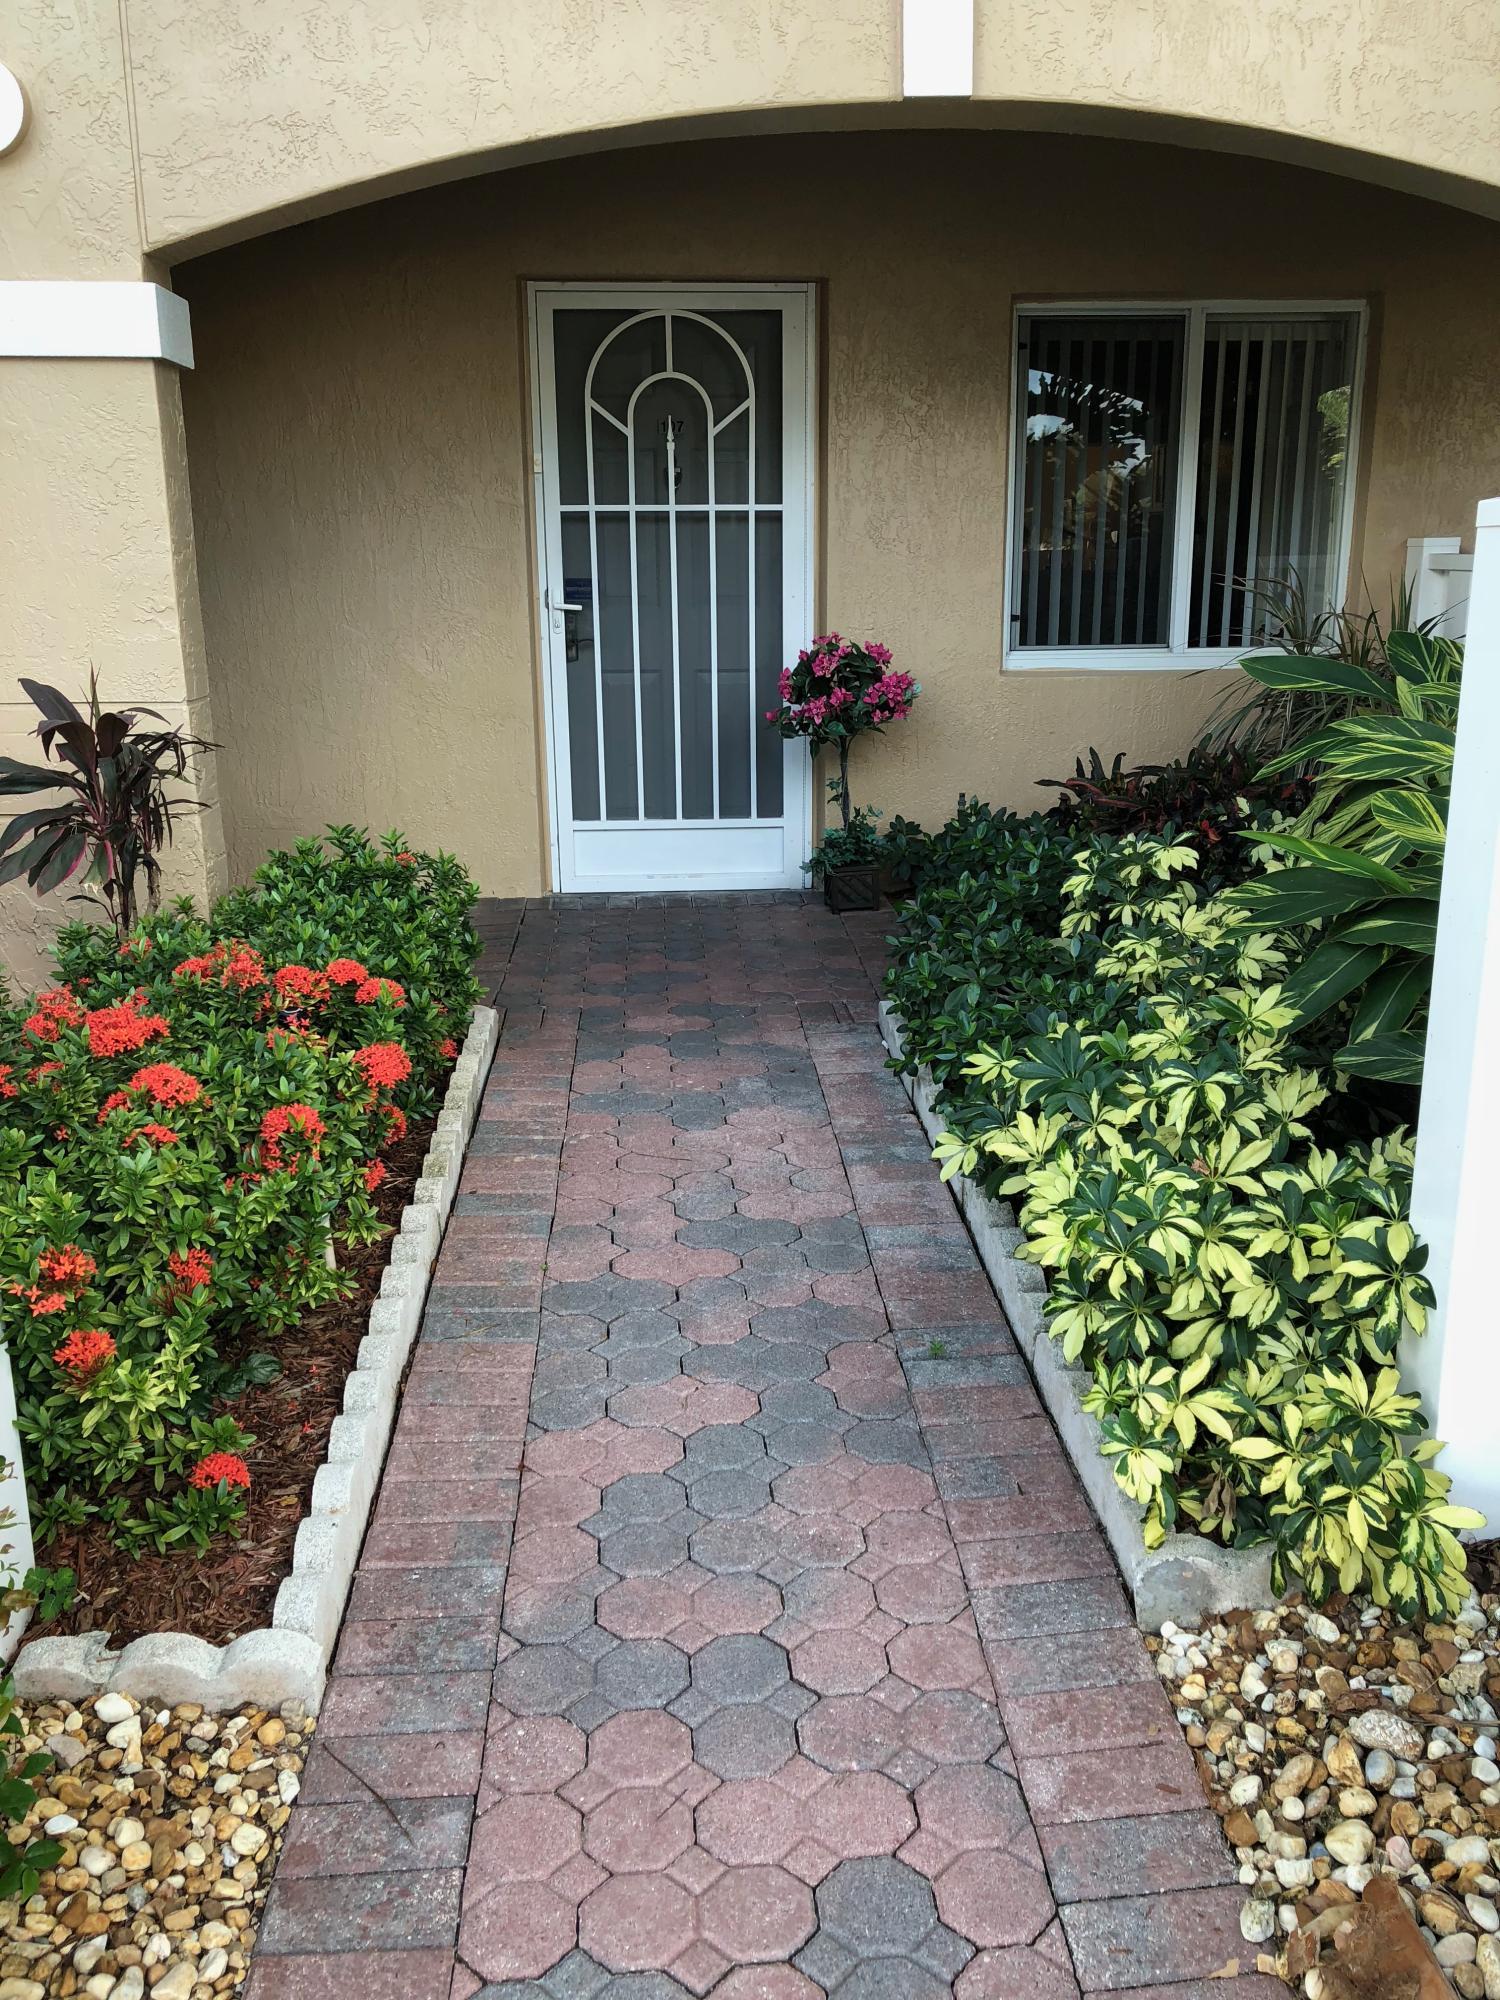 12540 Majesty Circle 107 Boynton Beach, FL 33437